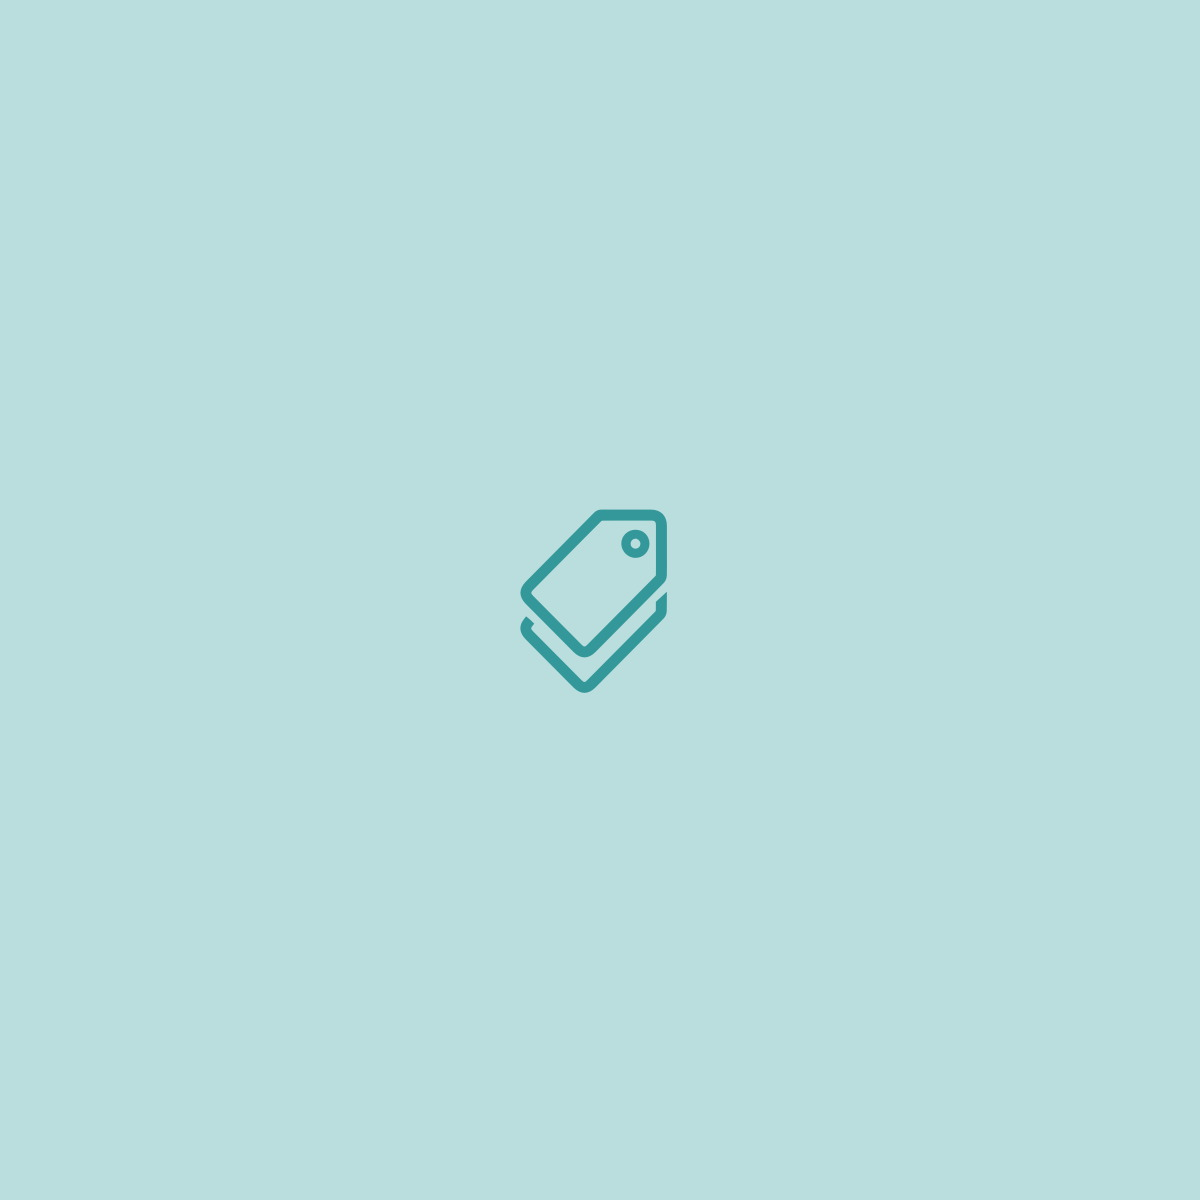 Papel De Parede Adesivo Pedra Filetes 1 00×0 50m Pr 22 No Elo7